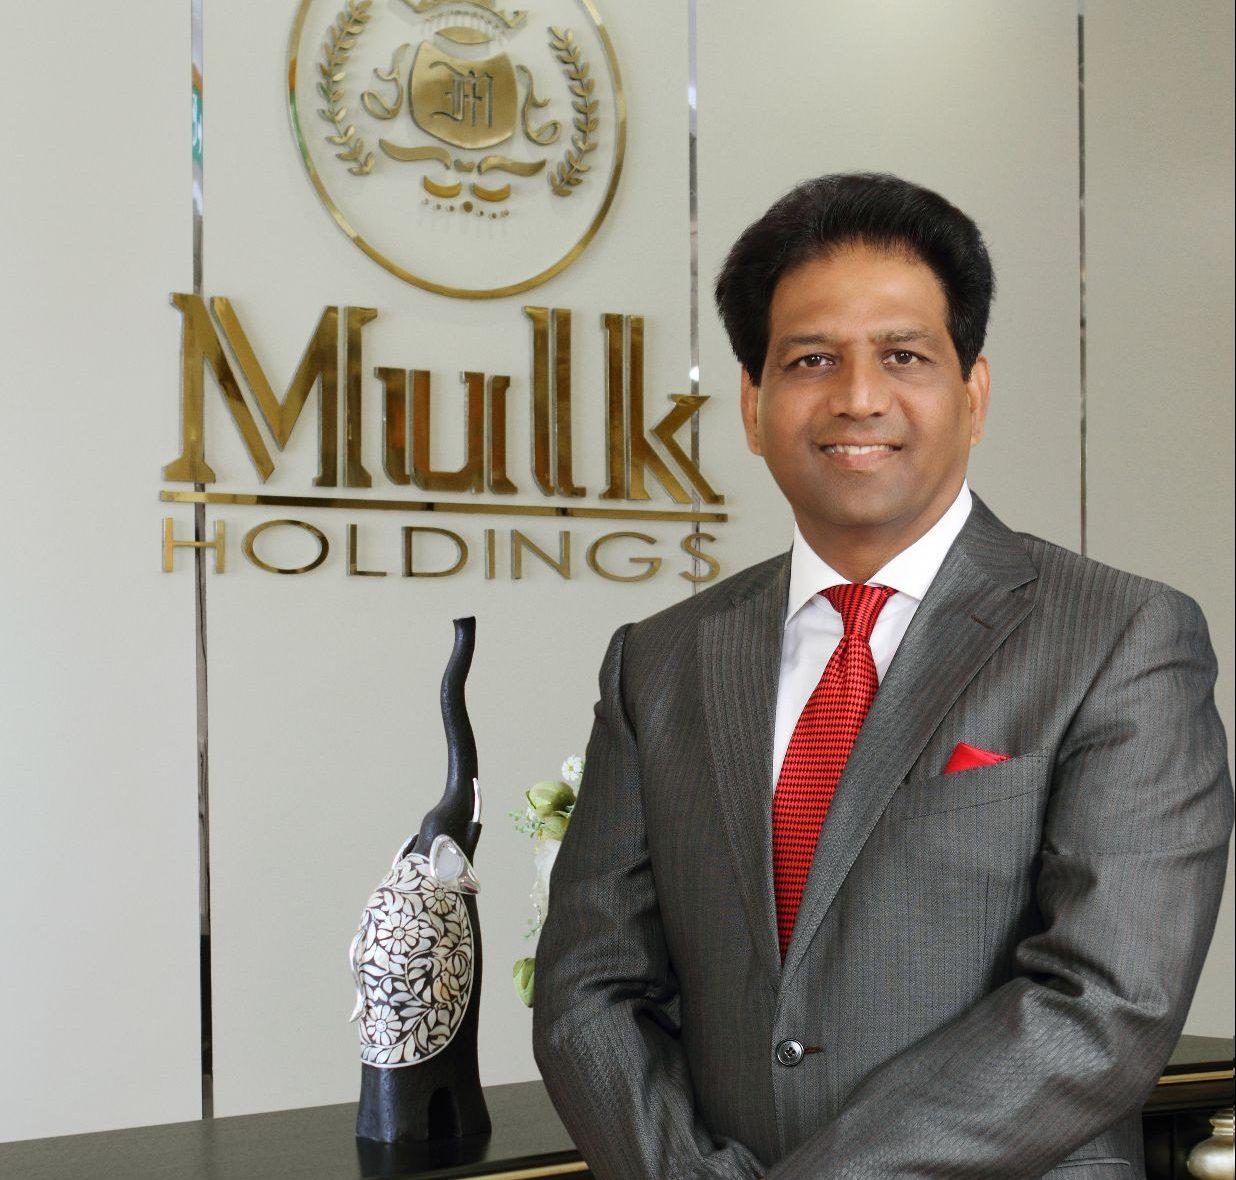 #9 Mulk Holdings